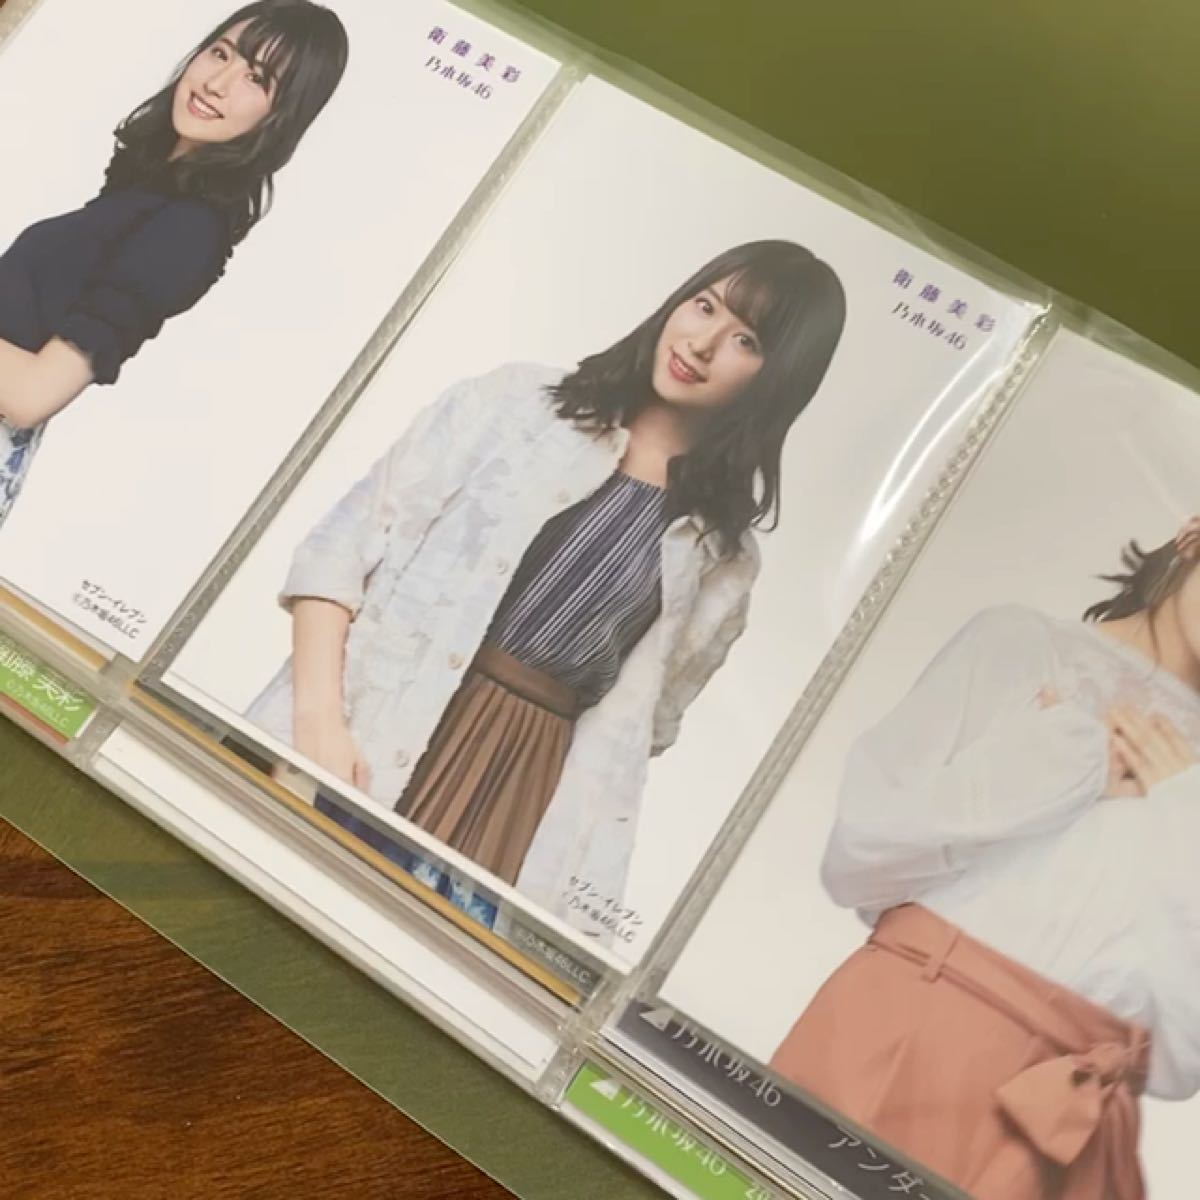 乃木坂46 衛藤美彩 生写真 お得セット全90枚!!